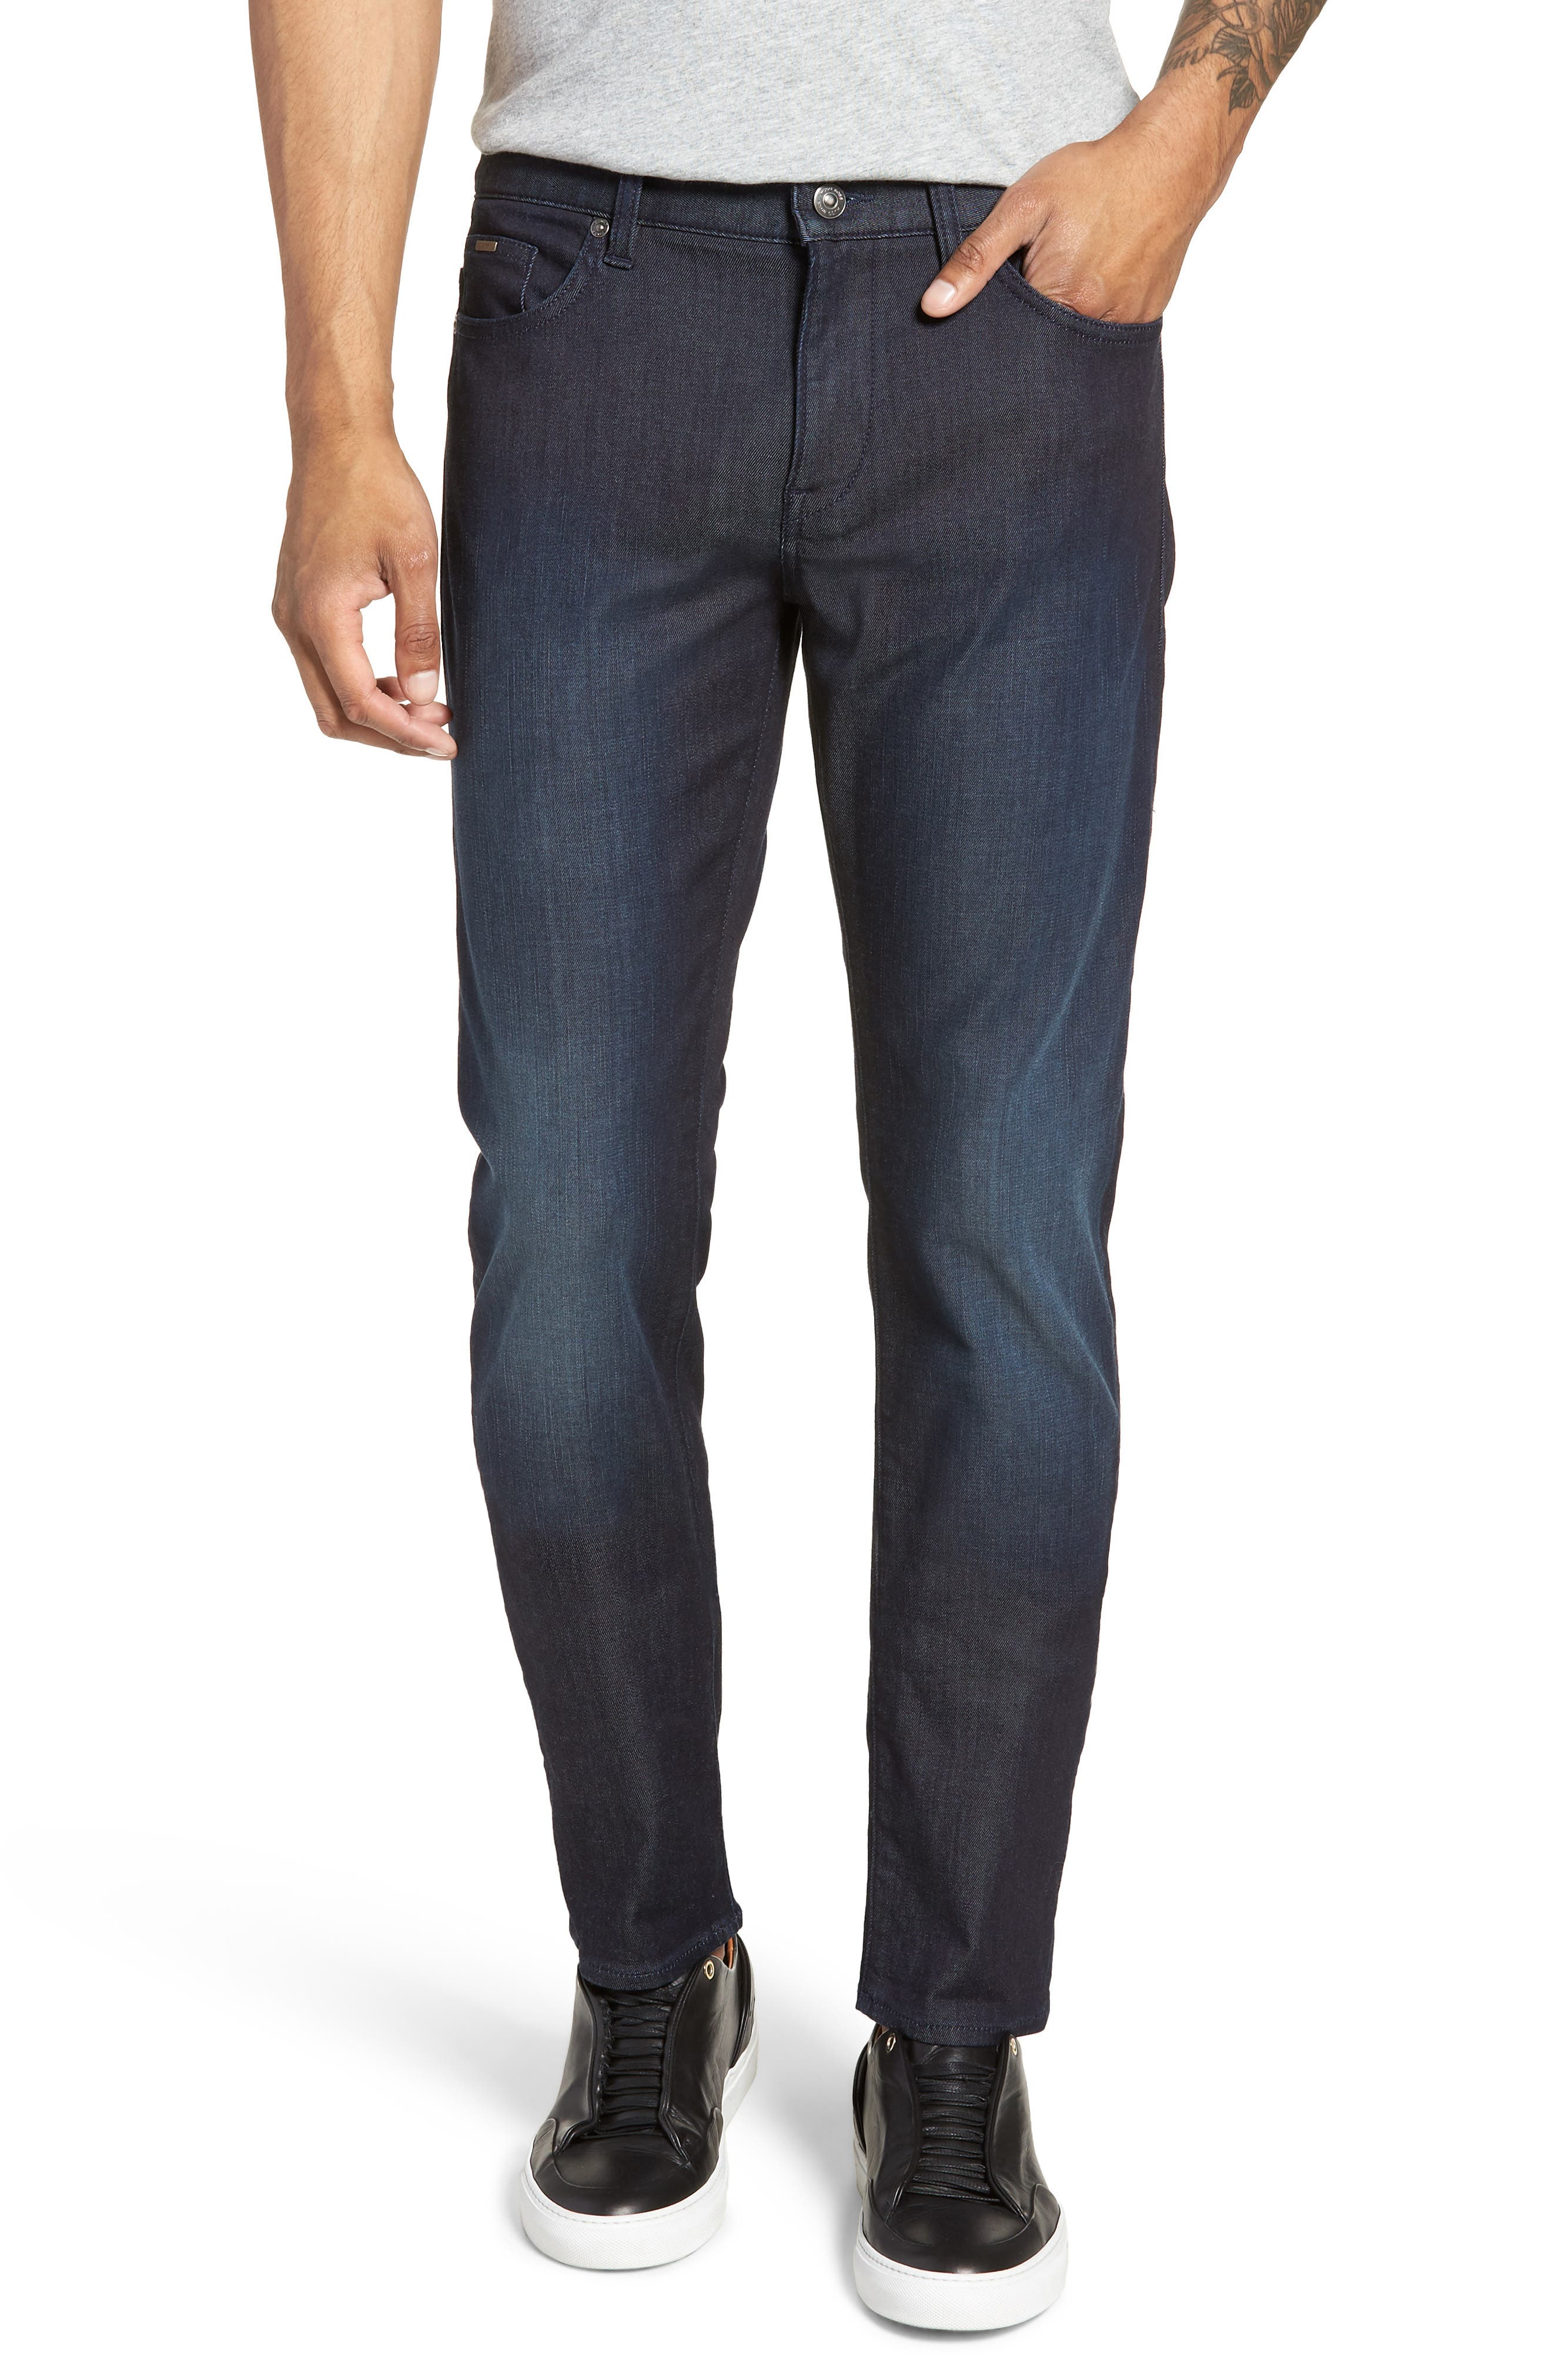 Delaware Slim Fit Jeans,                             Main thumbnail 1, color,